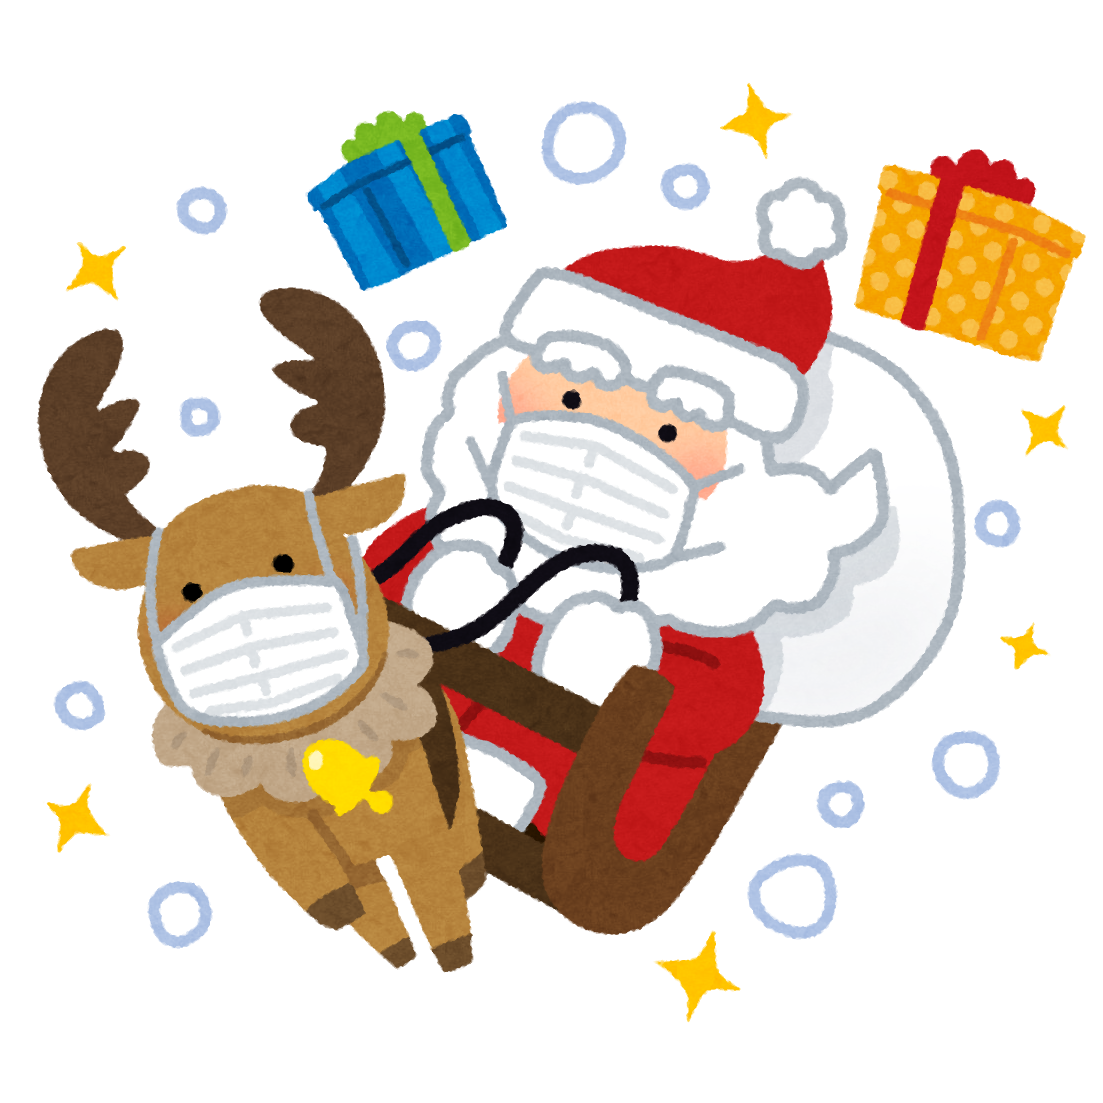 https://1.bp.blogspot.com/-xRE8fggFEAs/X8BV4cGFpYI/AAAAAAABcgE/sgoe7drgu0kgTkUweELLBeGZK0tT7osKgCNcBGAsYHQ/s1103/christmas_mask_santa_tonakai.png